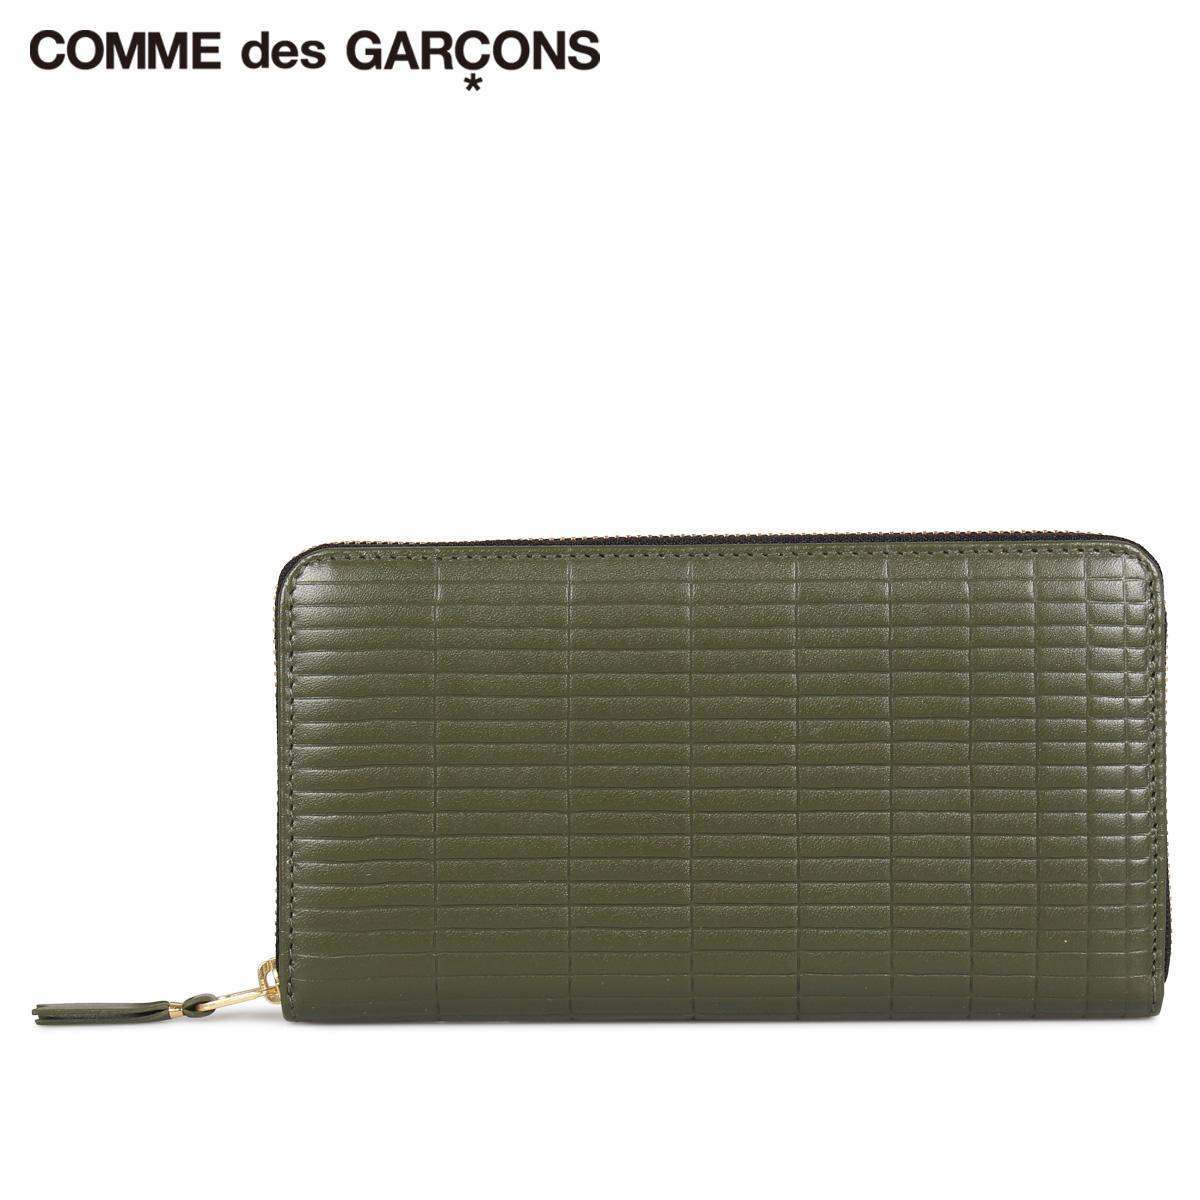 COMME des GARCONS BRICK WALLET コムデギャルソン 財布 長財布 メンズ レディース ラウンドファスナー カーキ SA0111BK